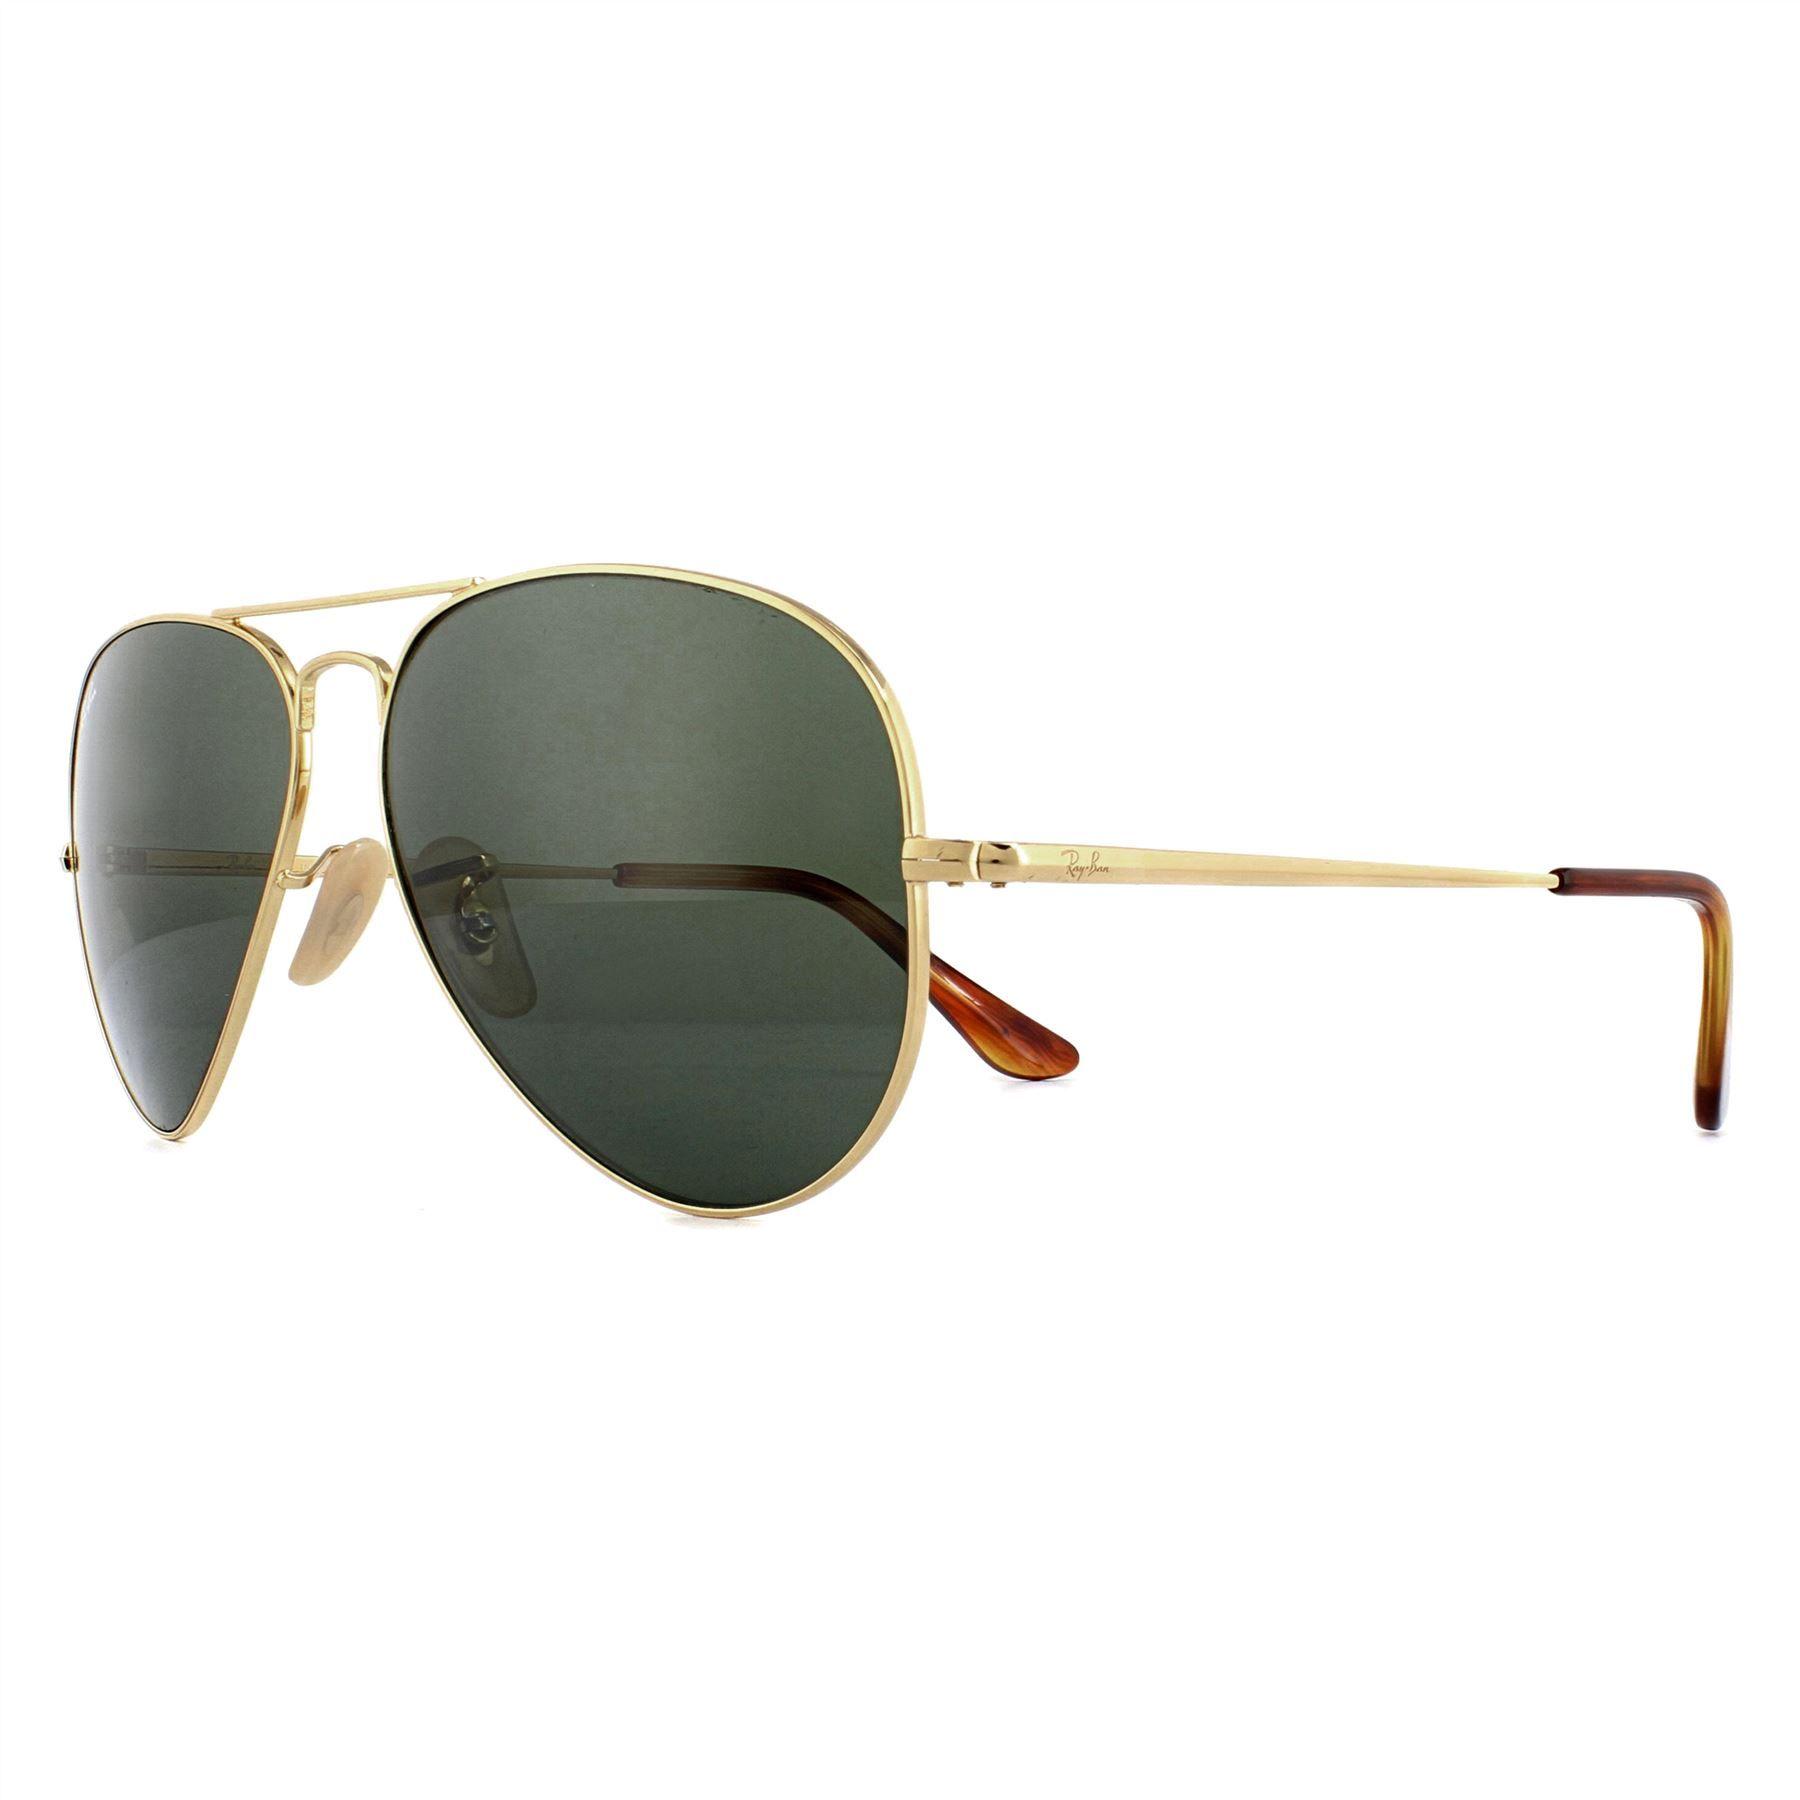 Ray-Ban Sunglasses Aviator Metal II RB3689 914731 Gold Green